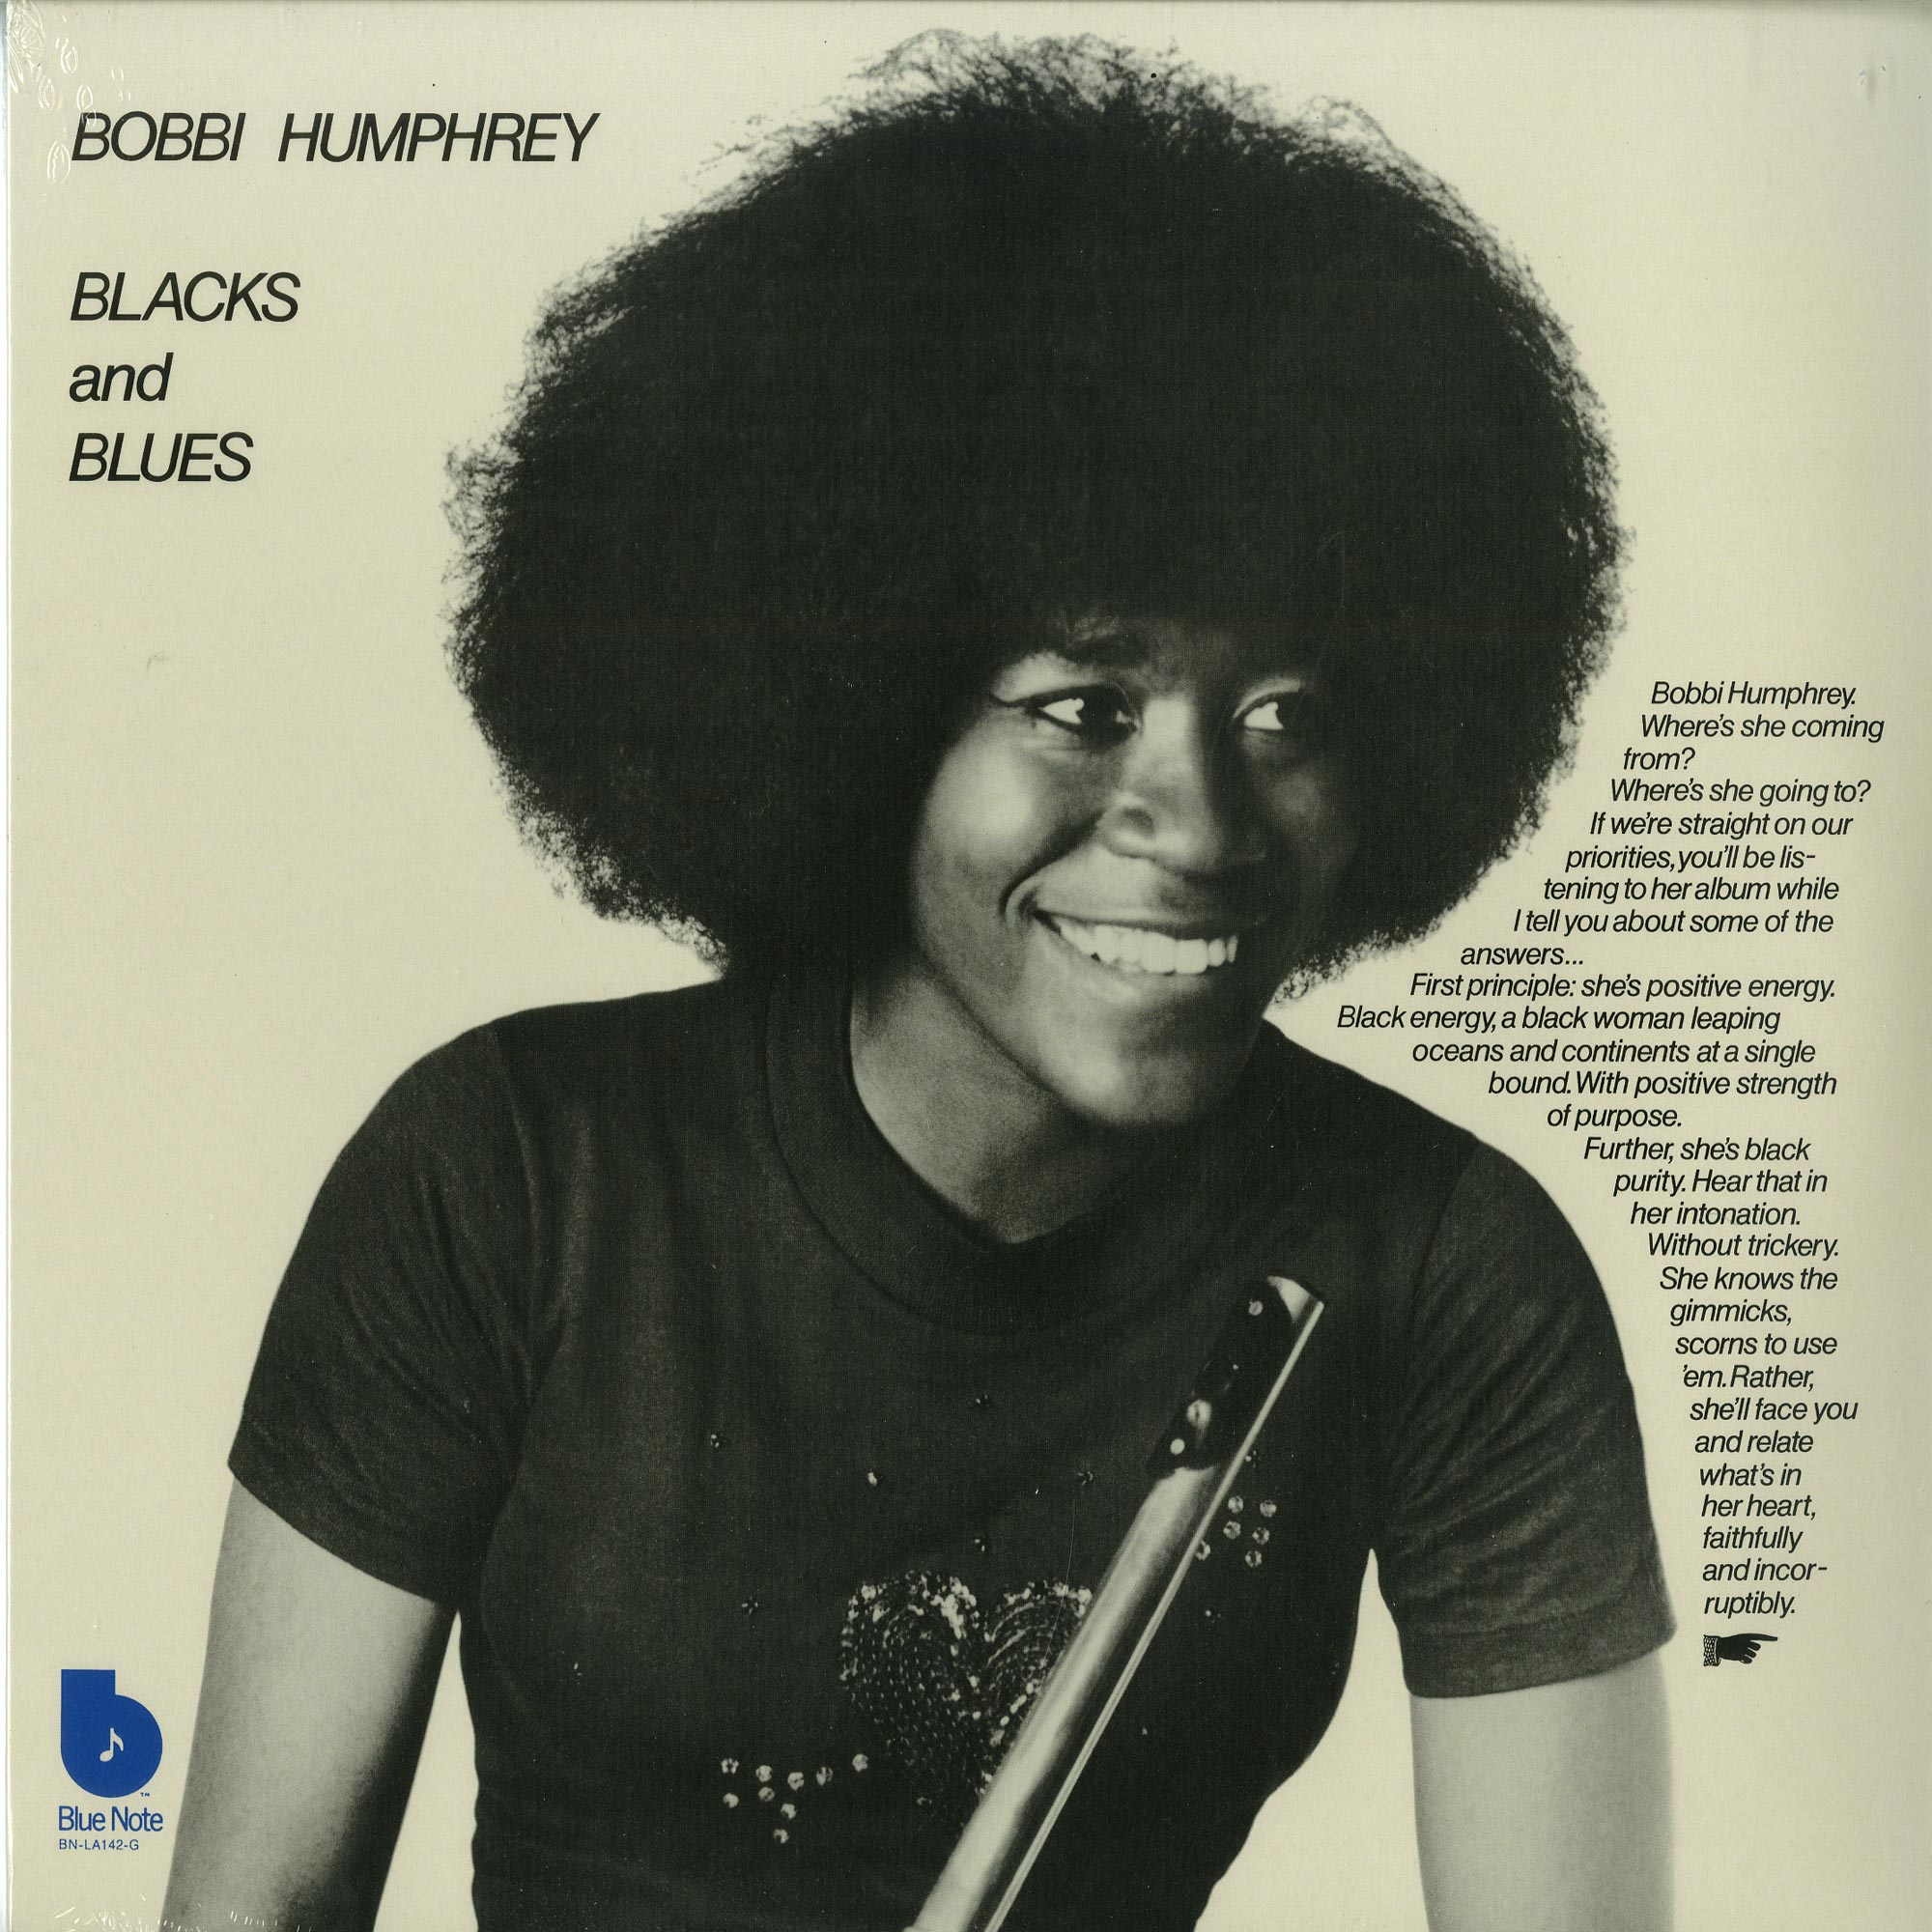 Bobbi Humphrey - BLACK AND BLUES